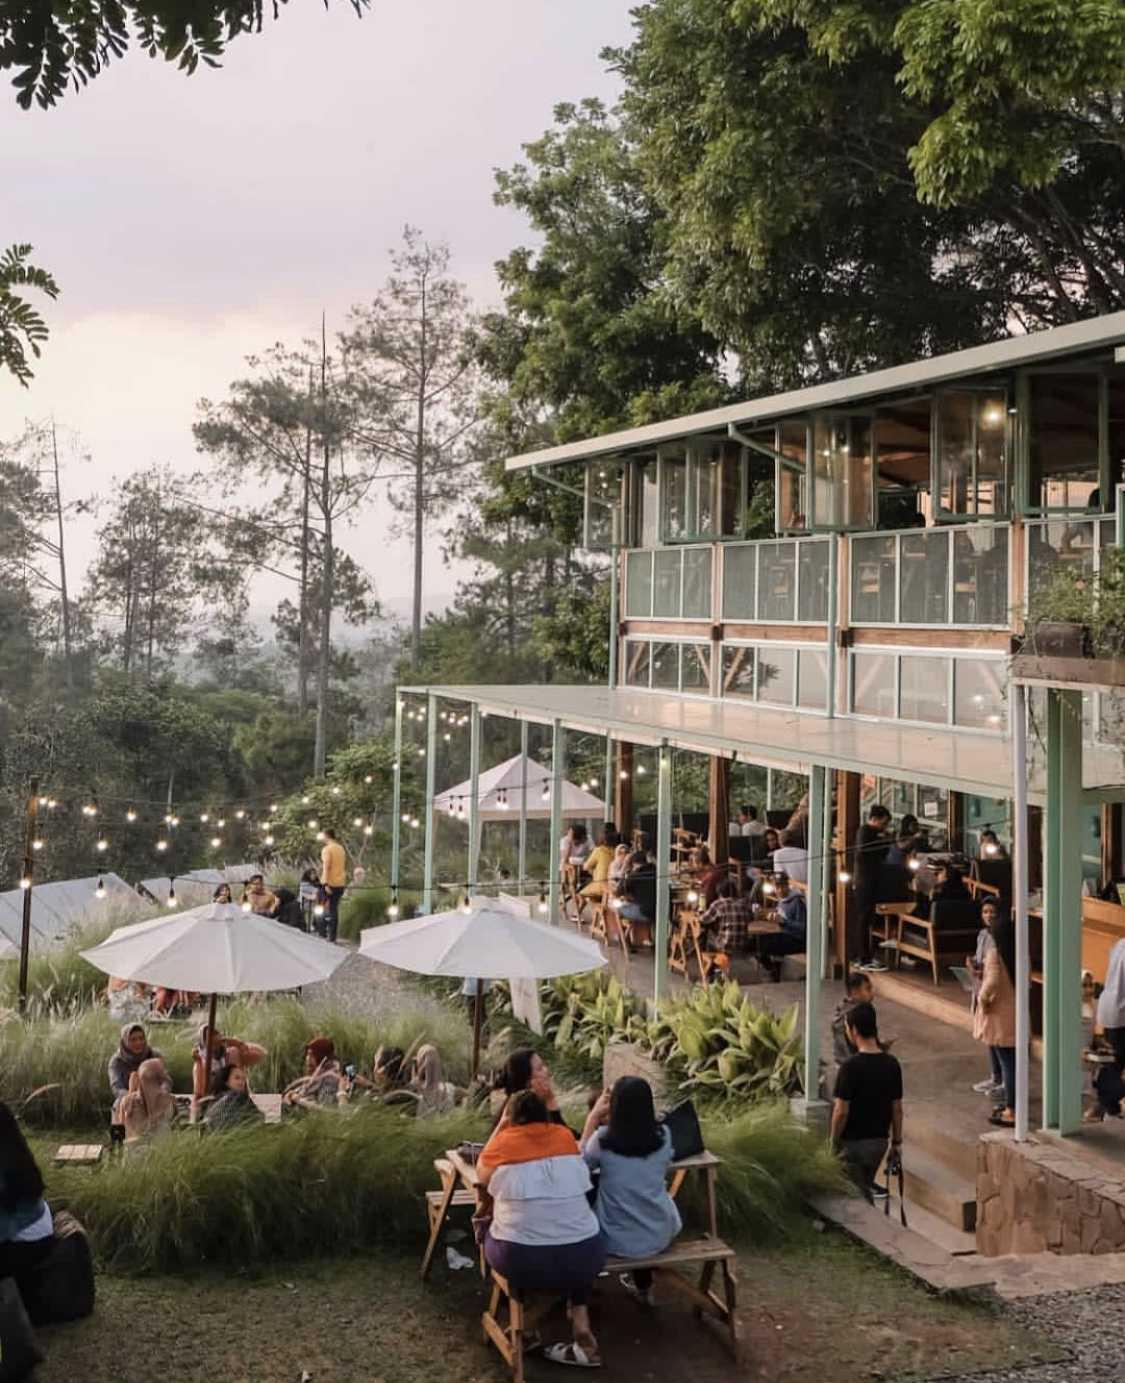 Kafe yang menyatu dengan alam, Utara Café karya Wandi Uwa Krisdian (Sumber: arsitag.com)